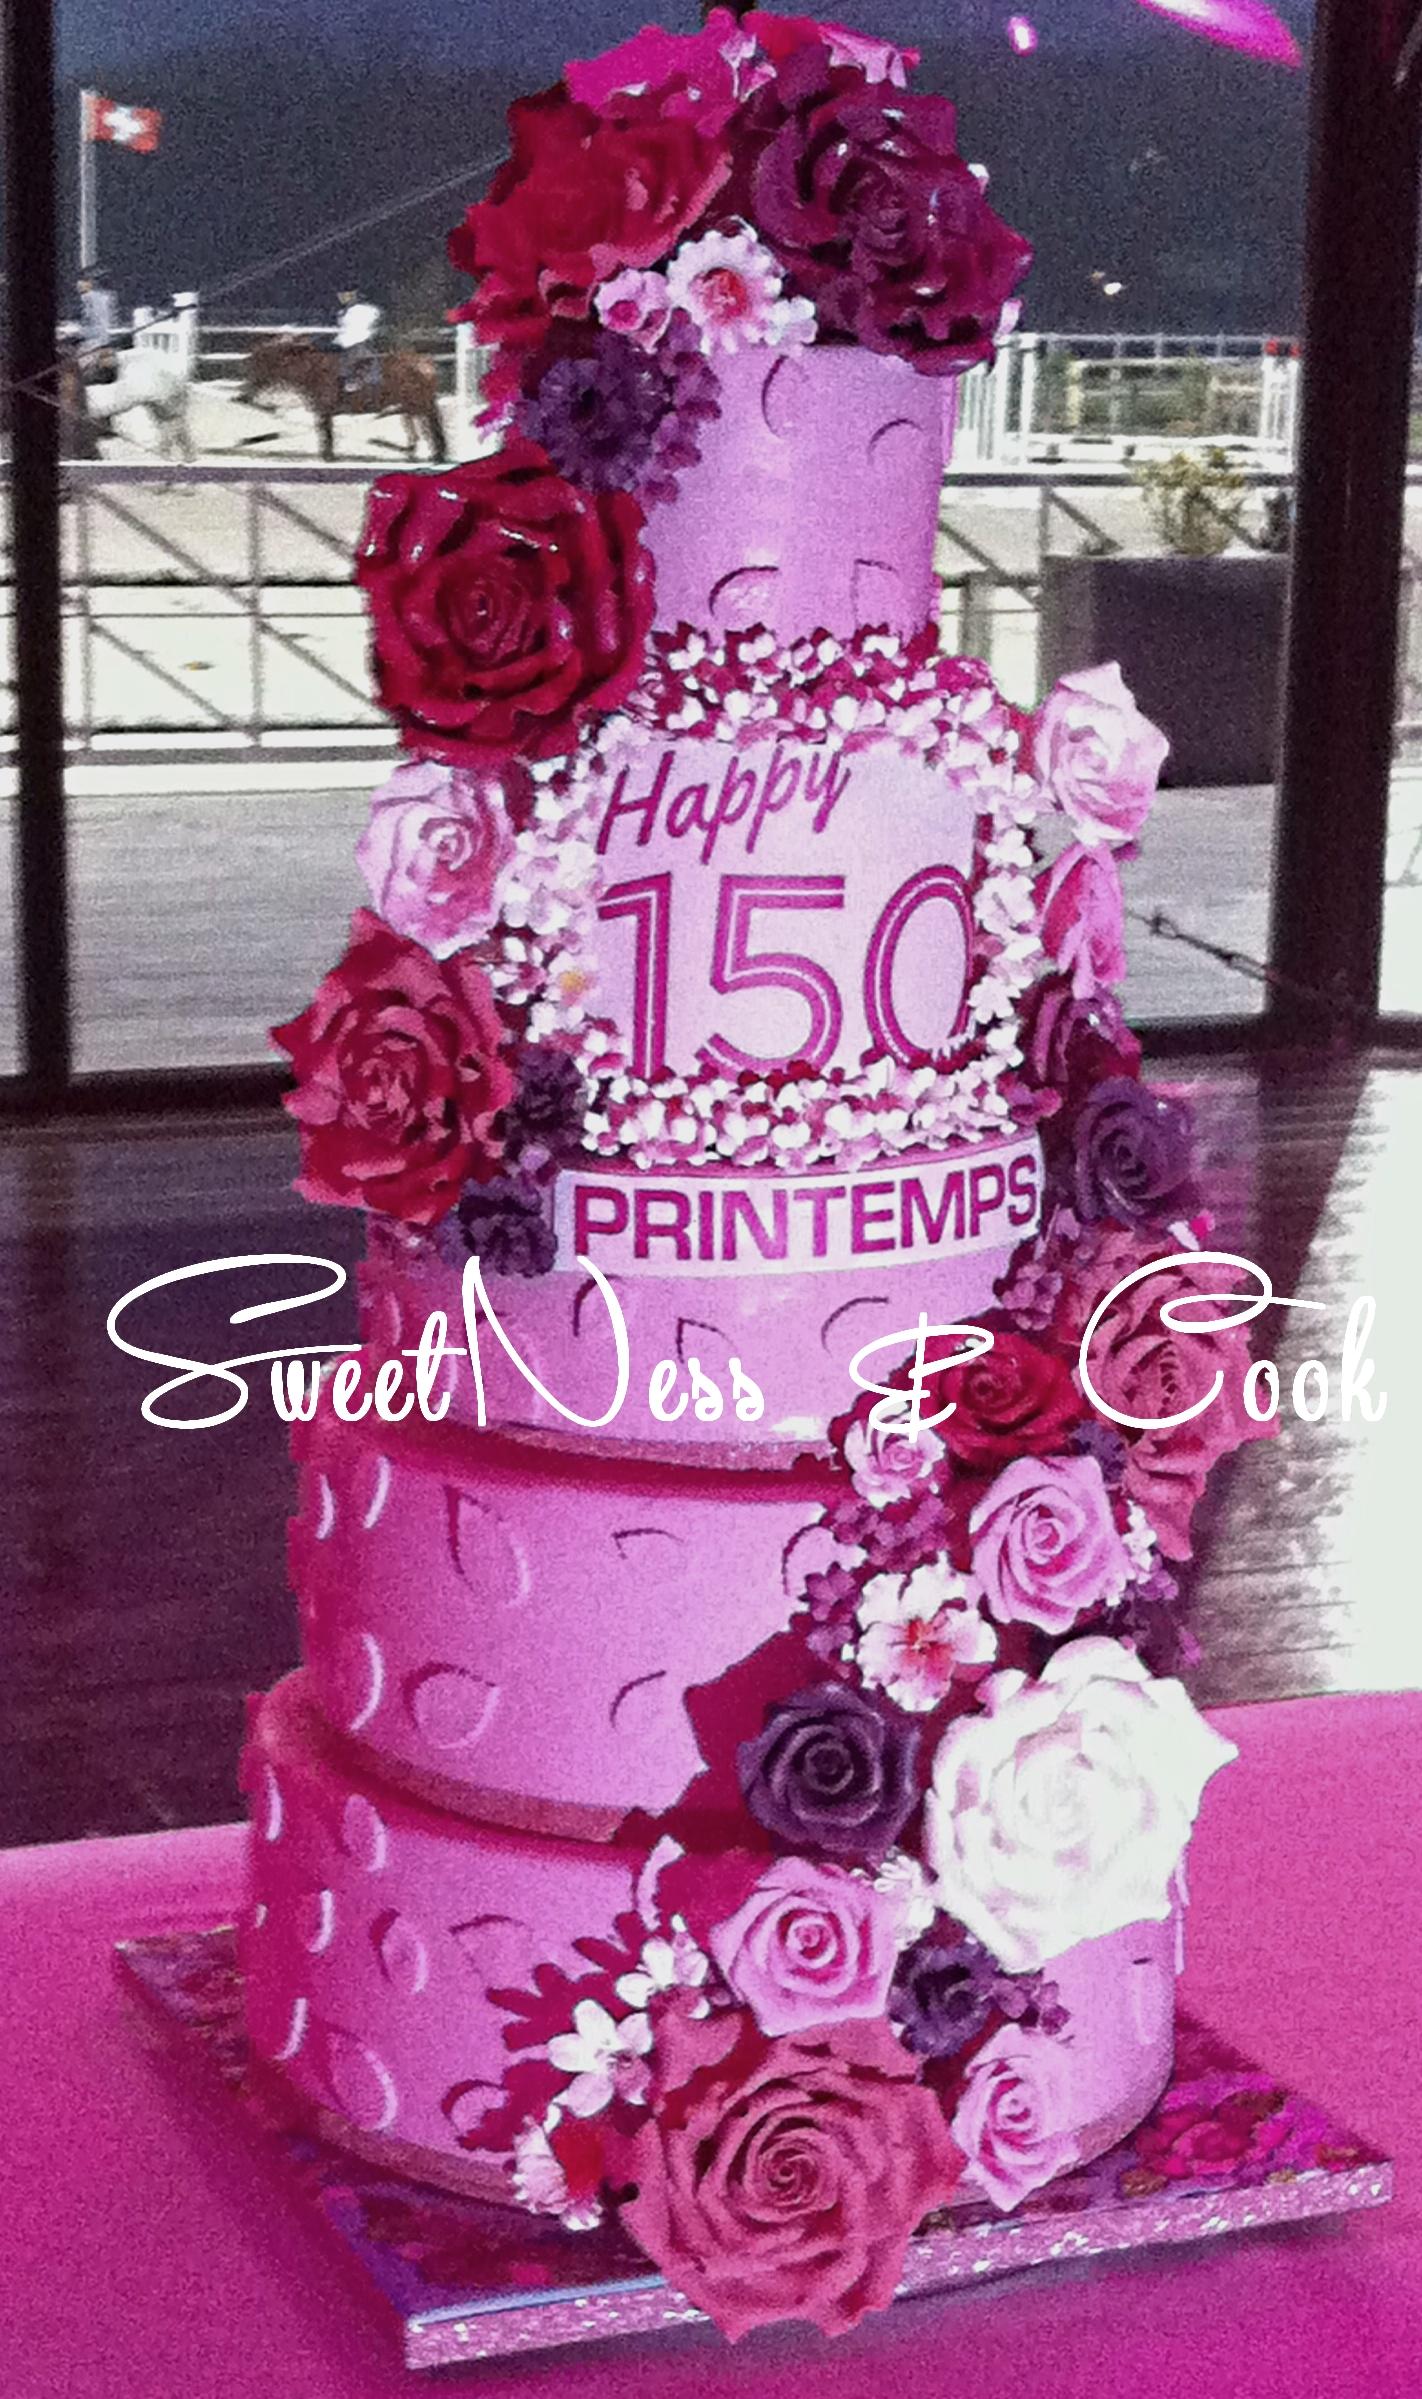 Wedding Cake Le Printemps